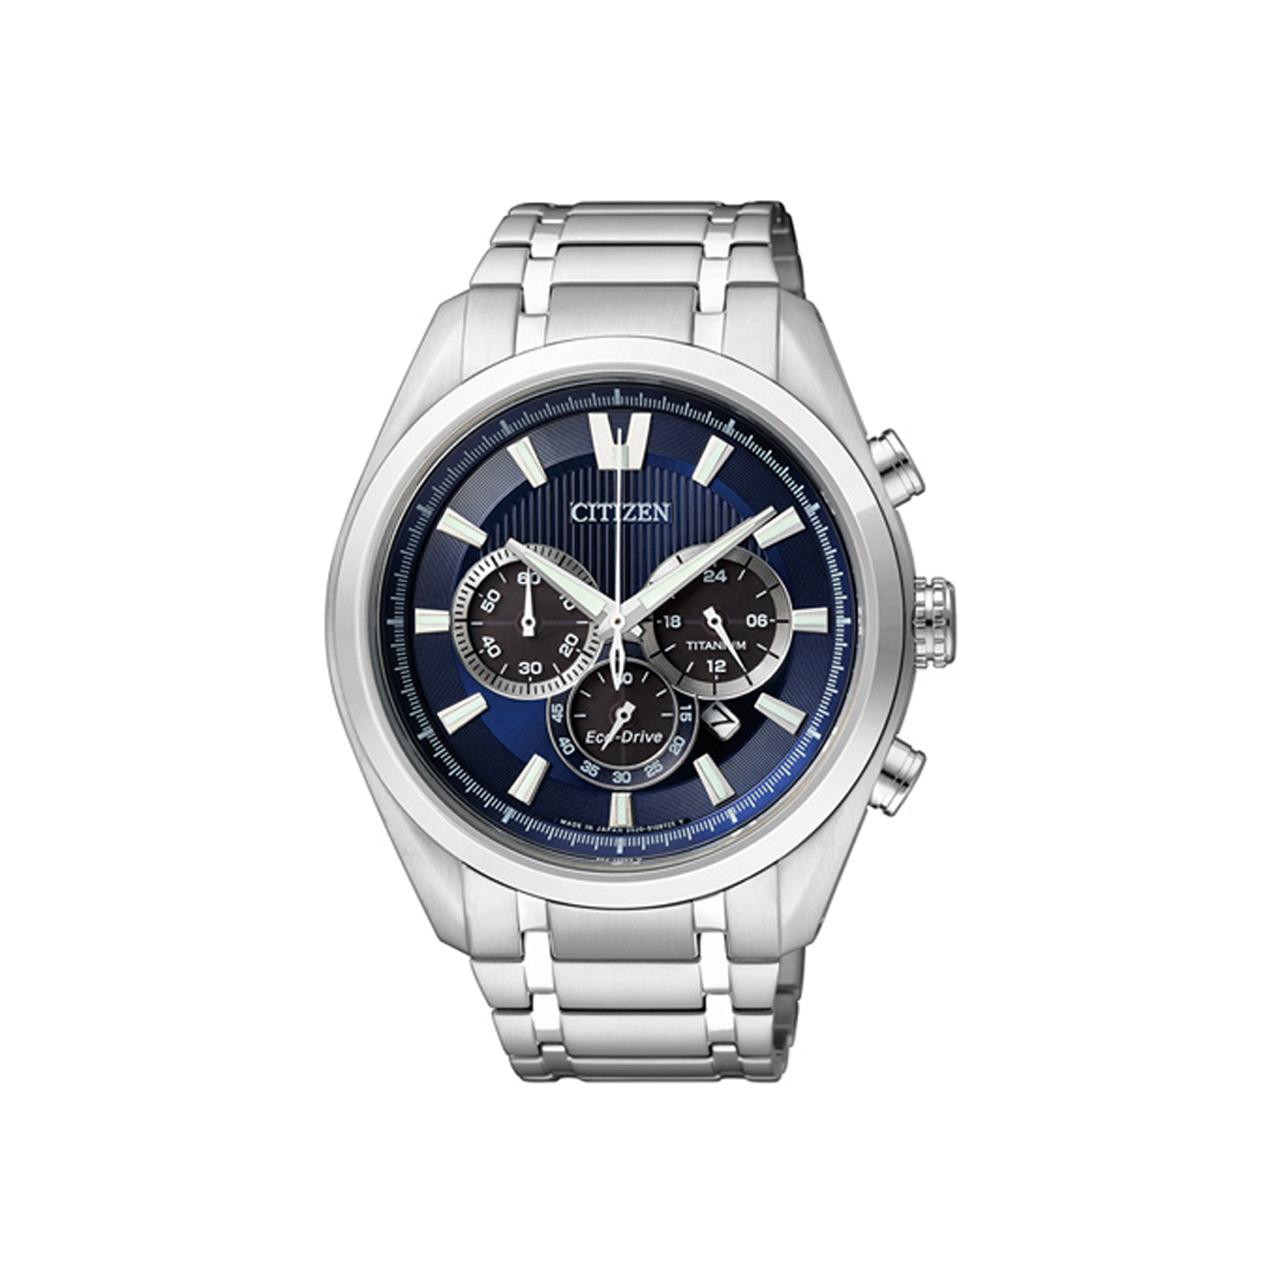 Citizen CA4010-58L Super Titanium Deep Blue Chrono Armbanduhr